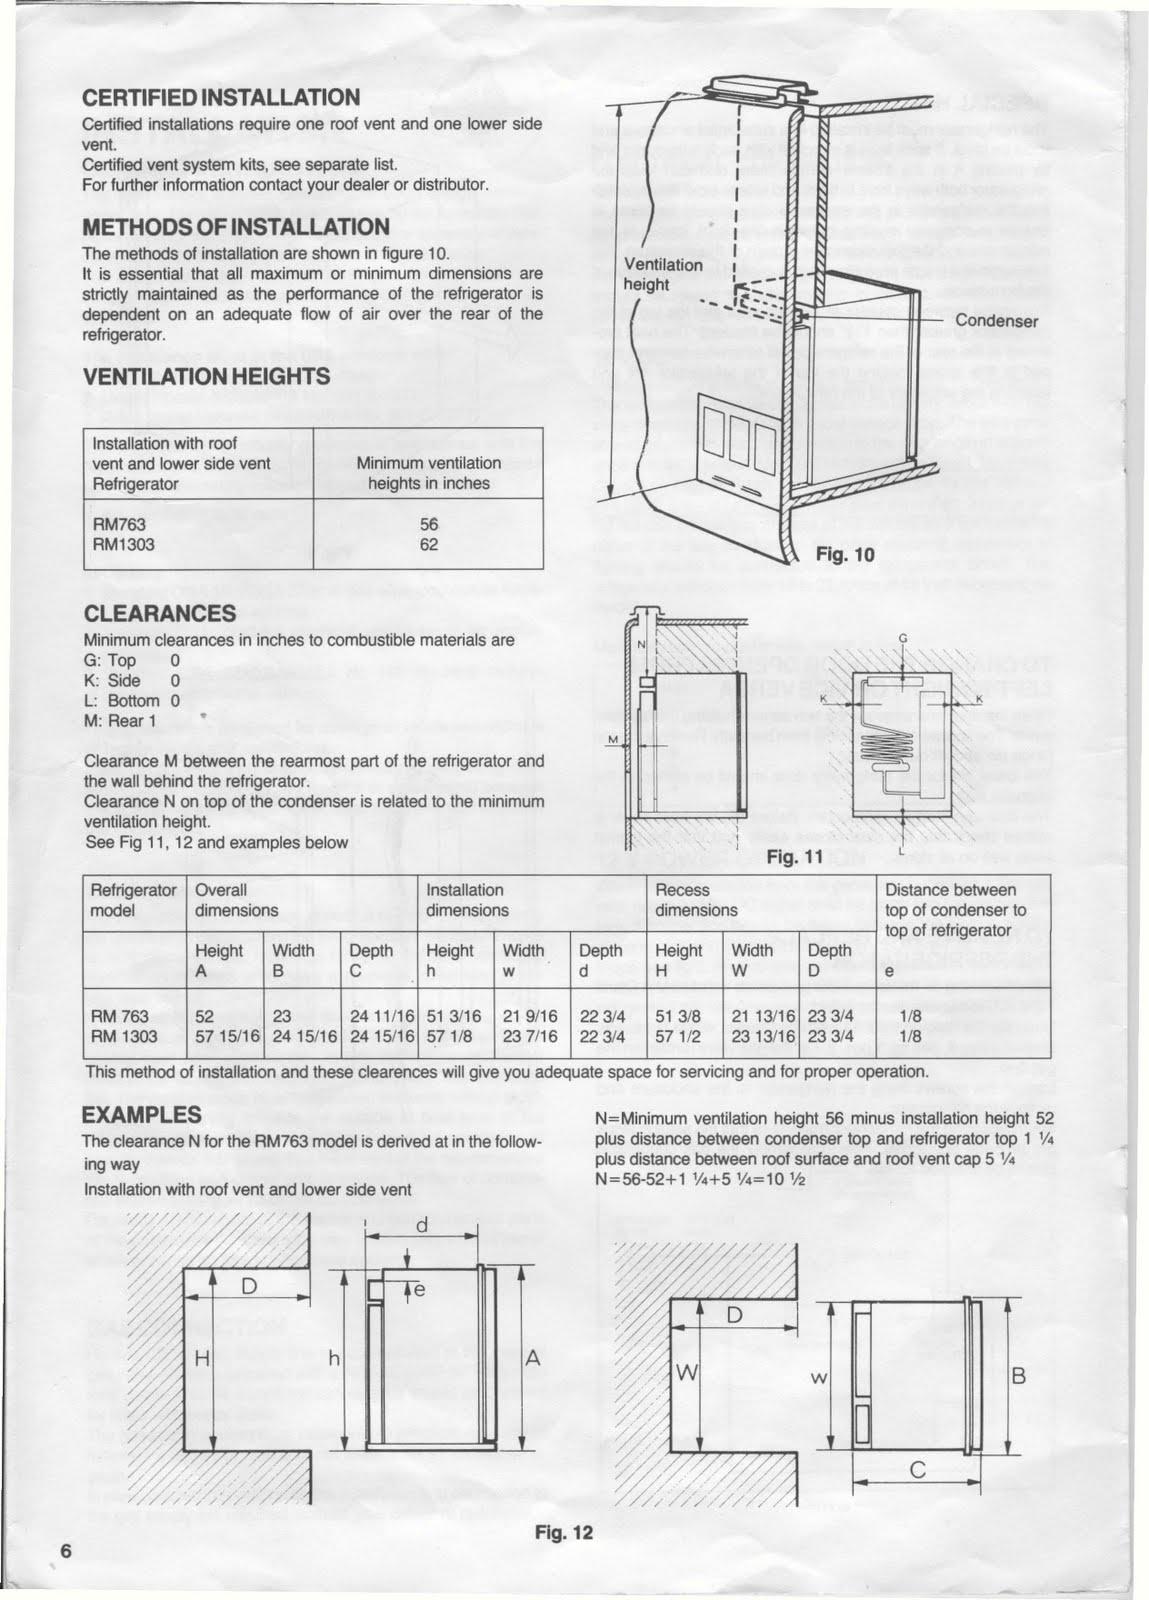 1983 fleetwood pace arrow owners manuals  dometic refridgerator rm